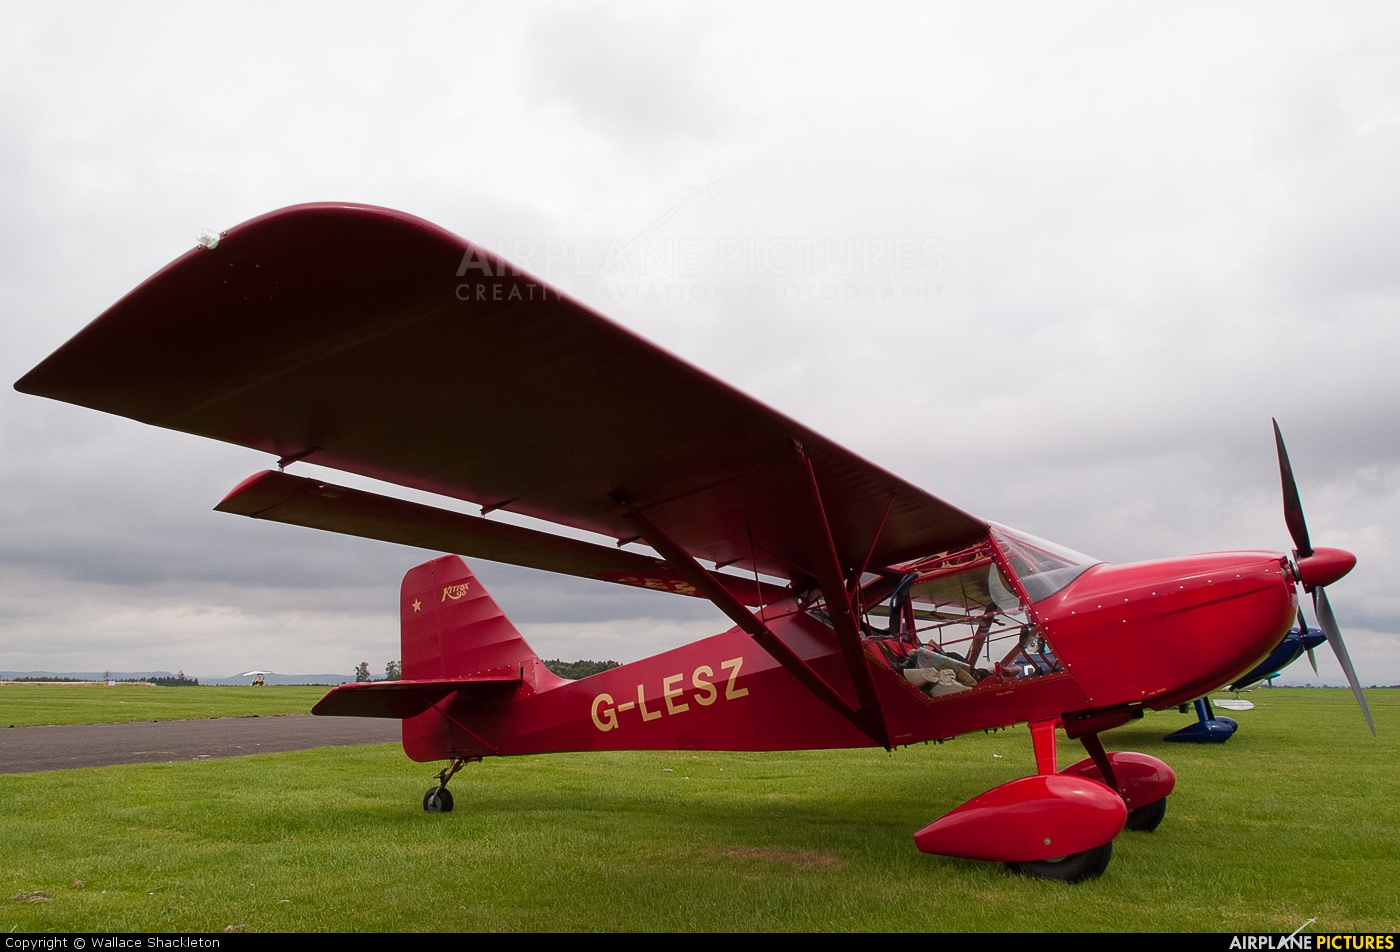 G-LESZ - Private Denney Kitfox at Perth - Scone | Photo ID